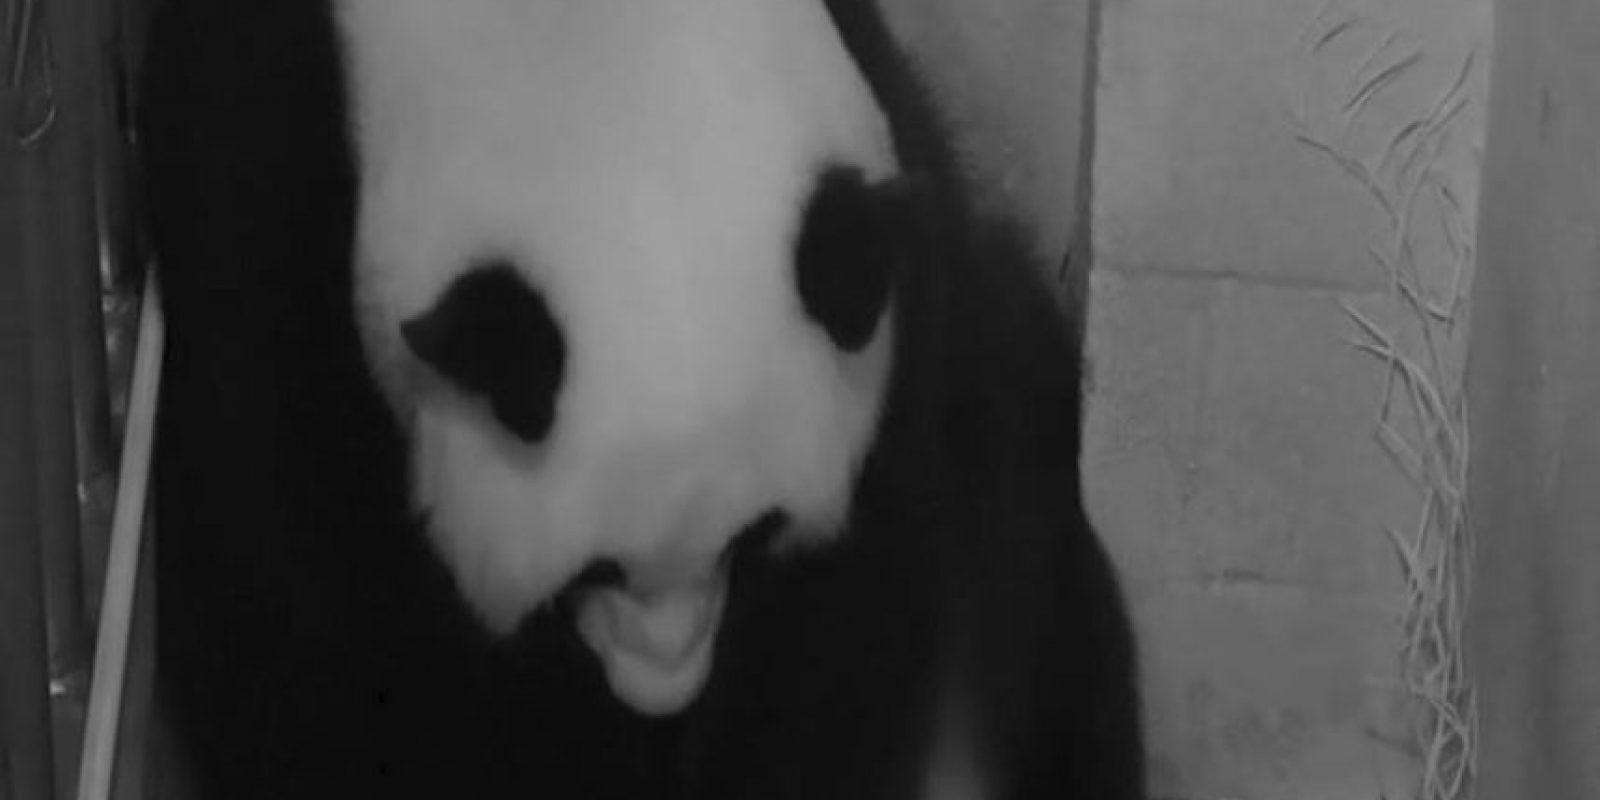 La madre panda se llama Mei Xiang. Foto:AFP